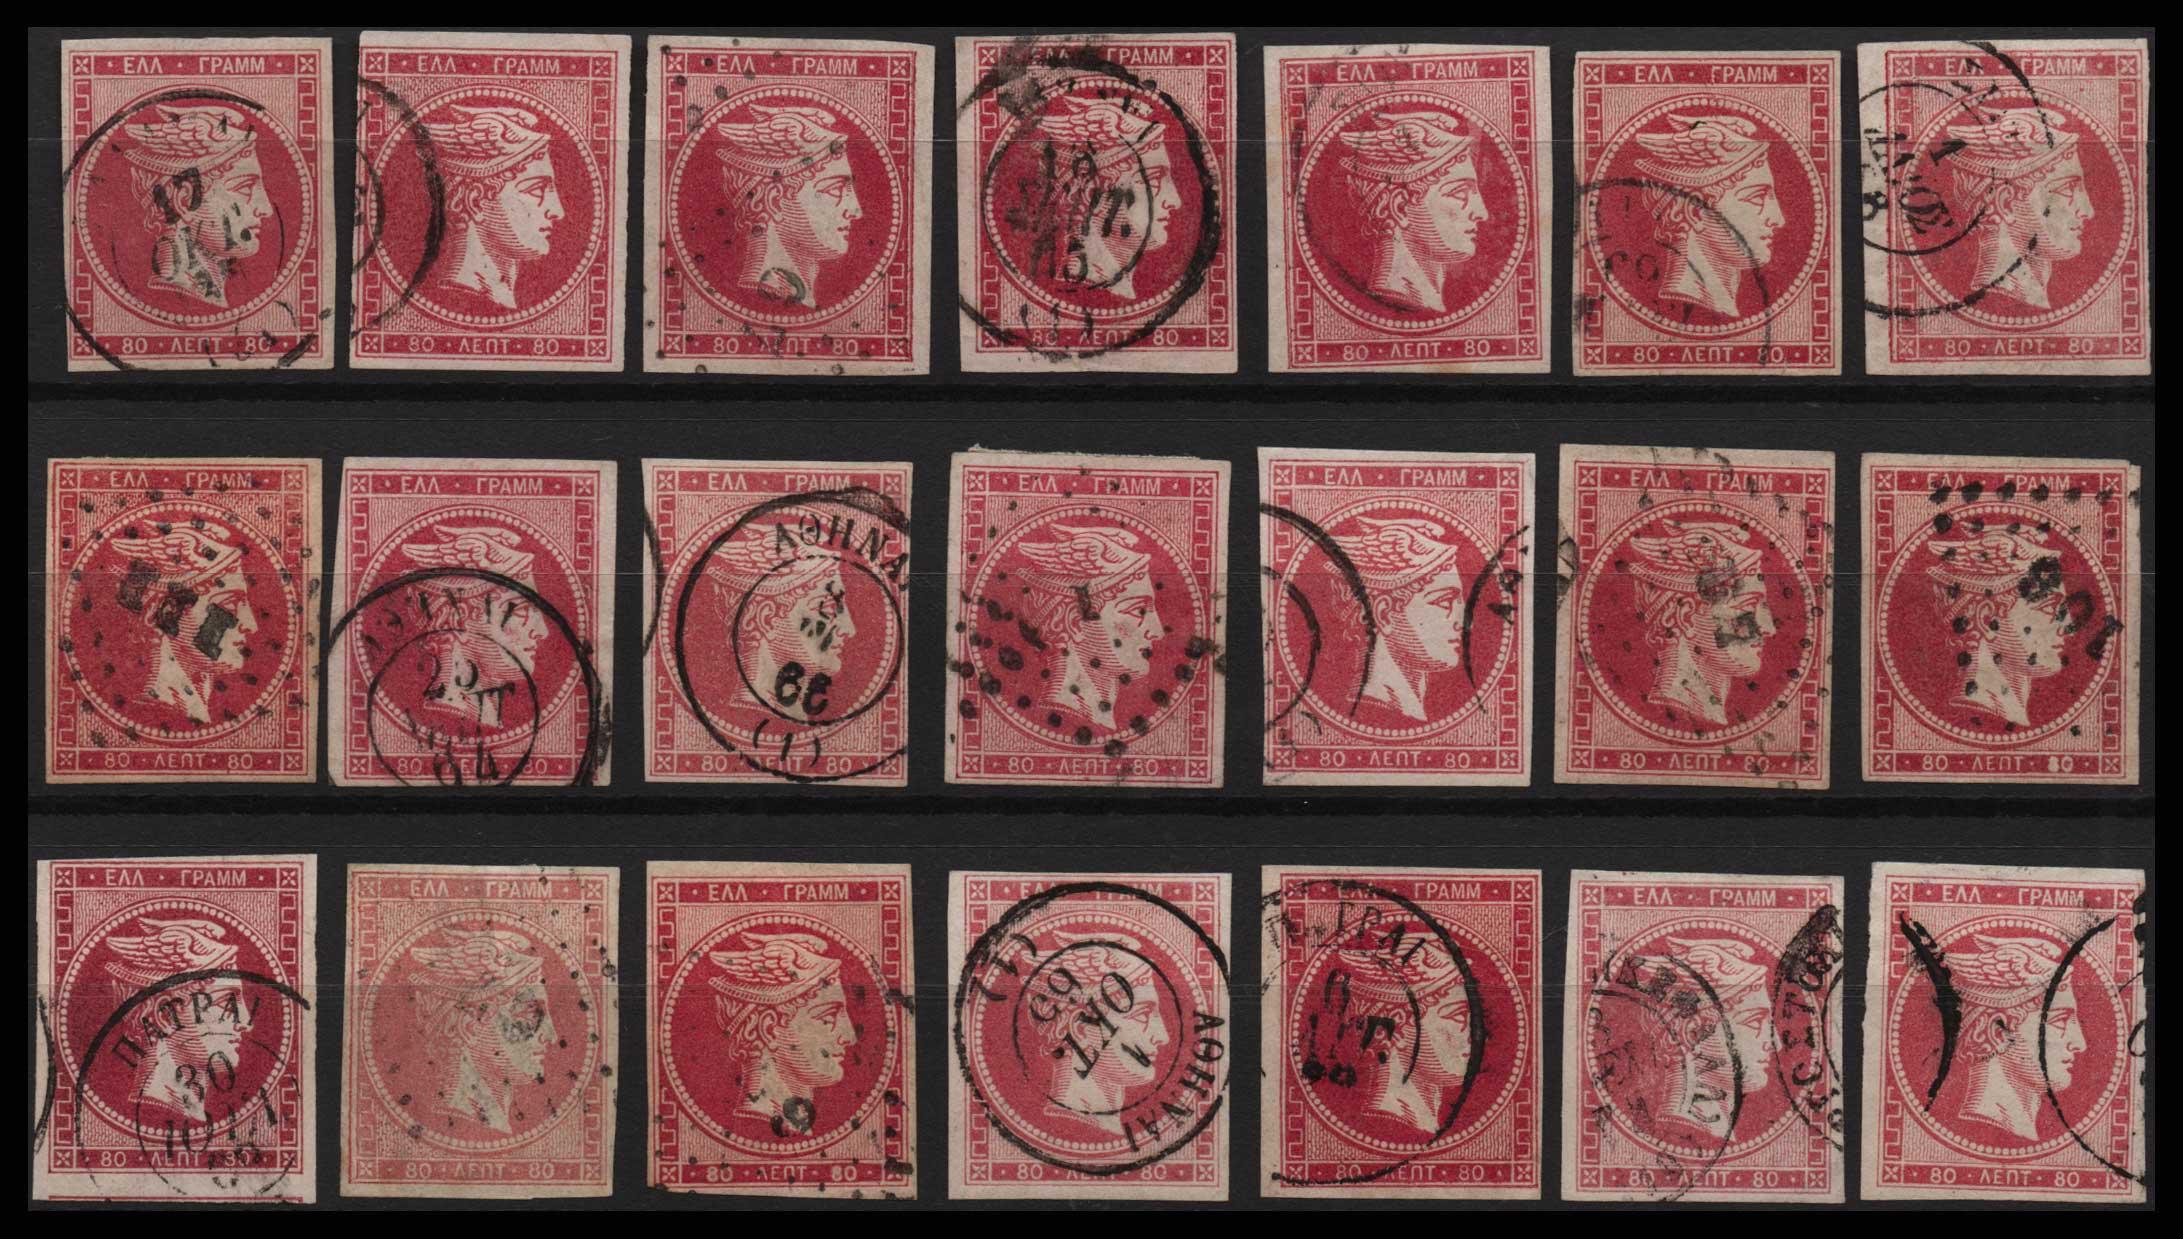 Lot 25 - -  LARGE HERMES HEAD large hermes head -  Athens Auctions Public Auction 83 General Stamp Sale